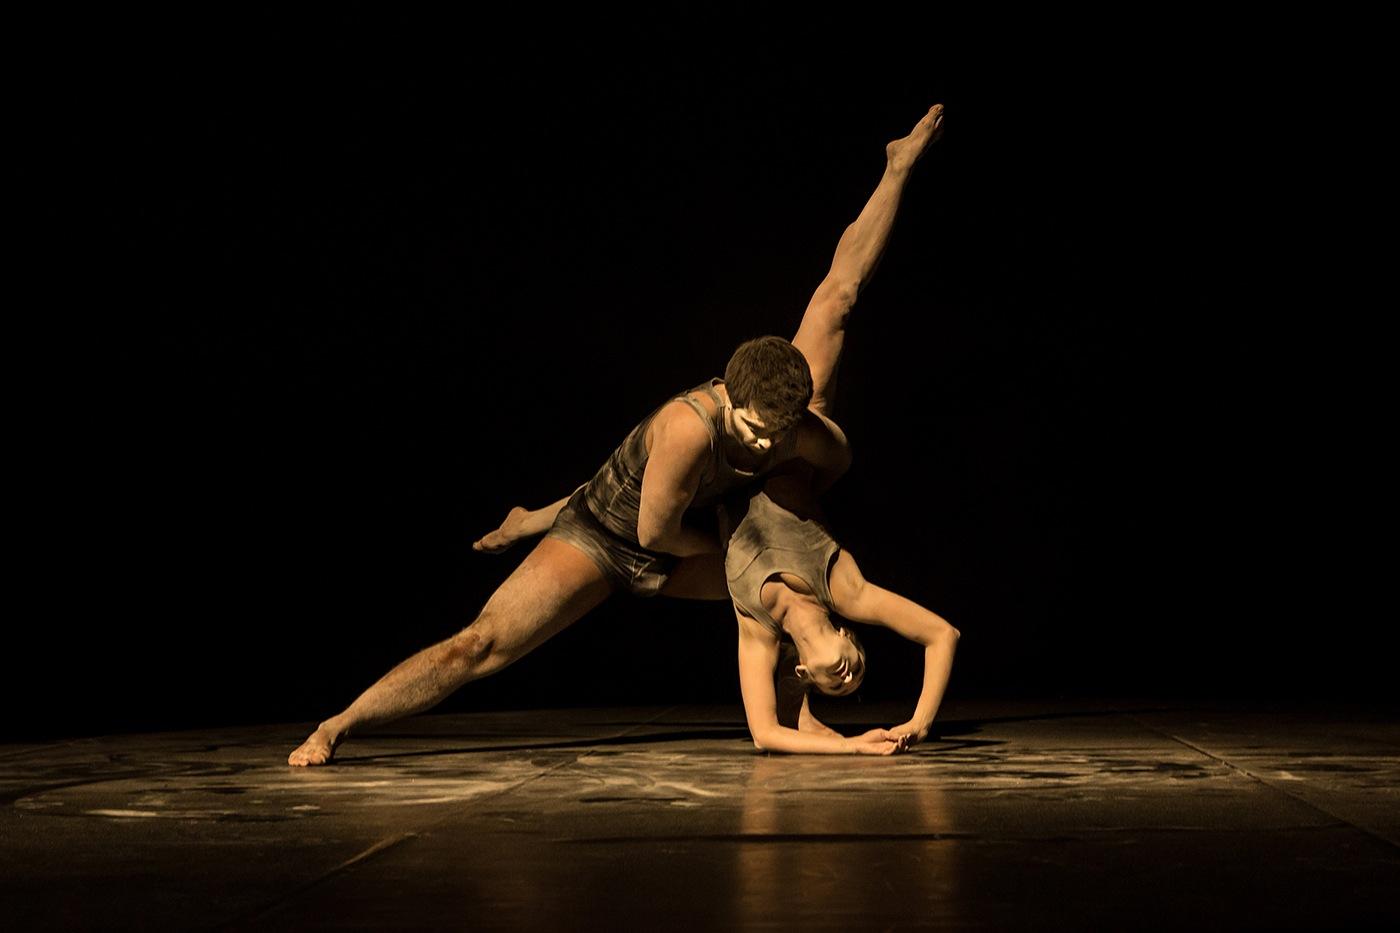 photographe-reportage-danse-avec-ton-crous-guillaume-heraud-021-small